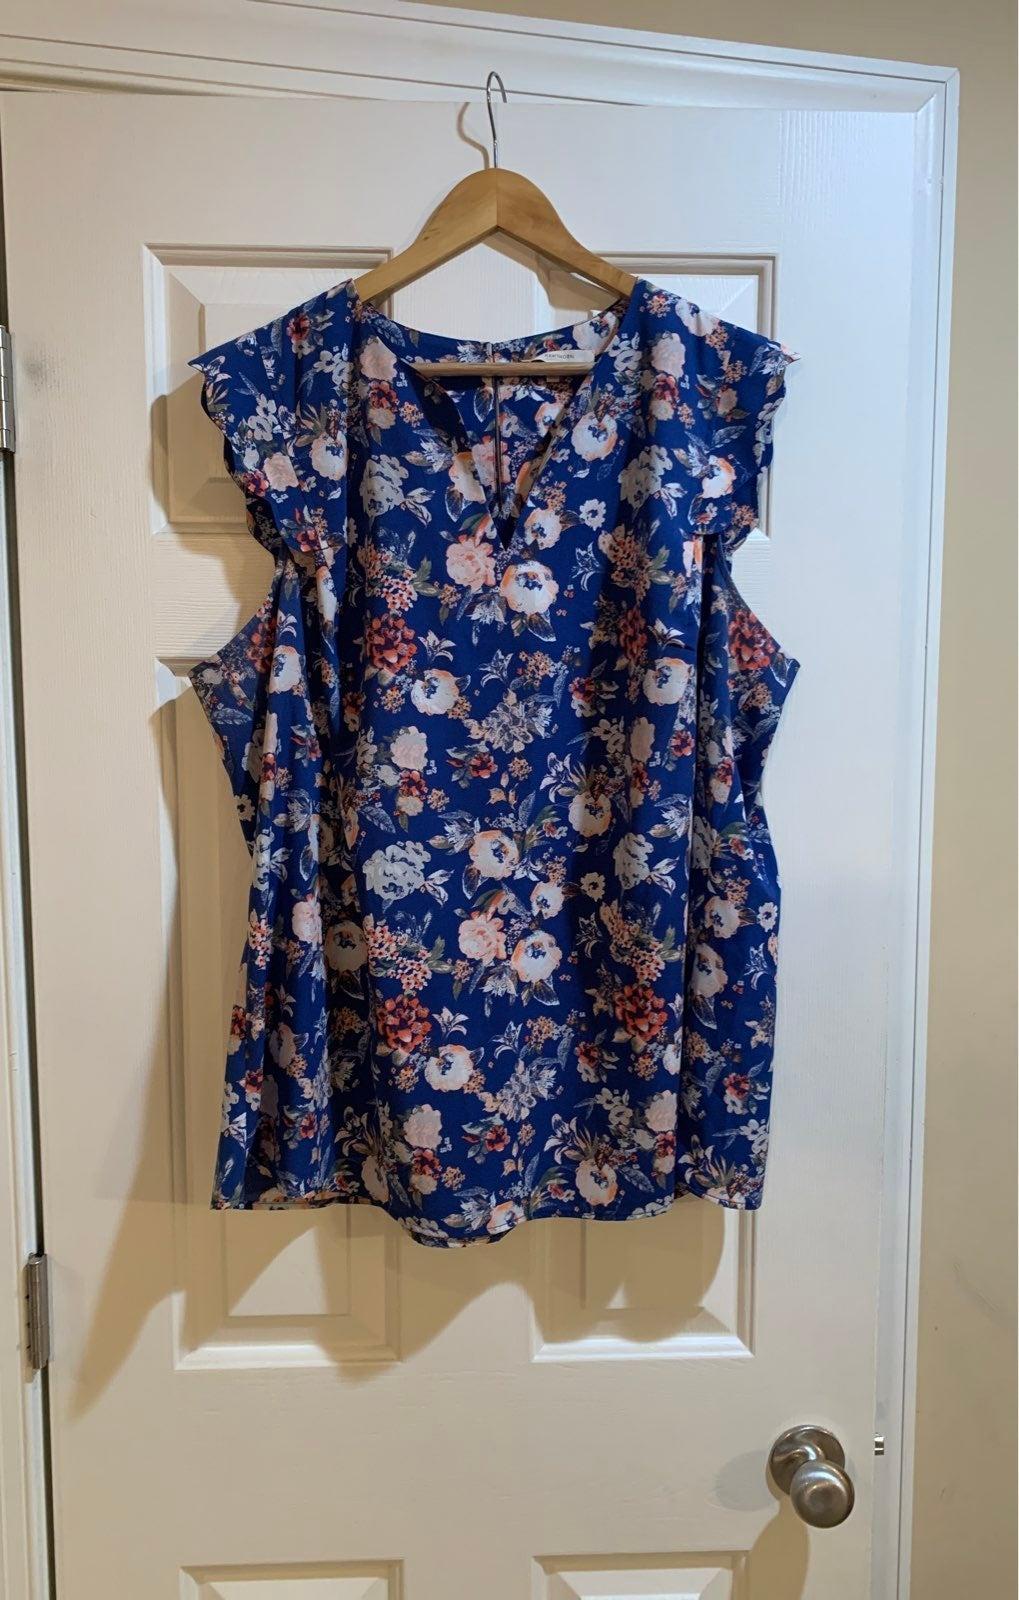 41 Hawthorn floral sleeveless top